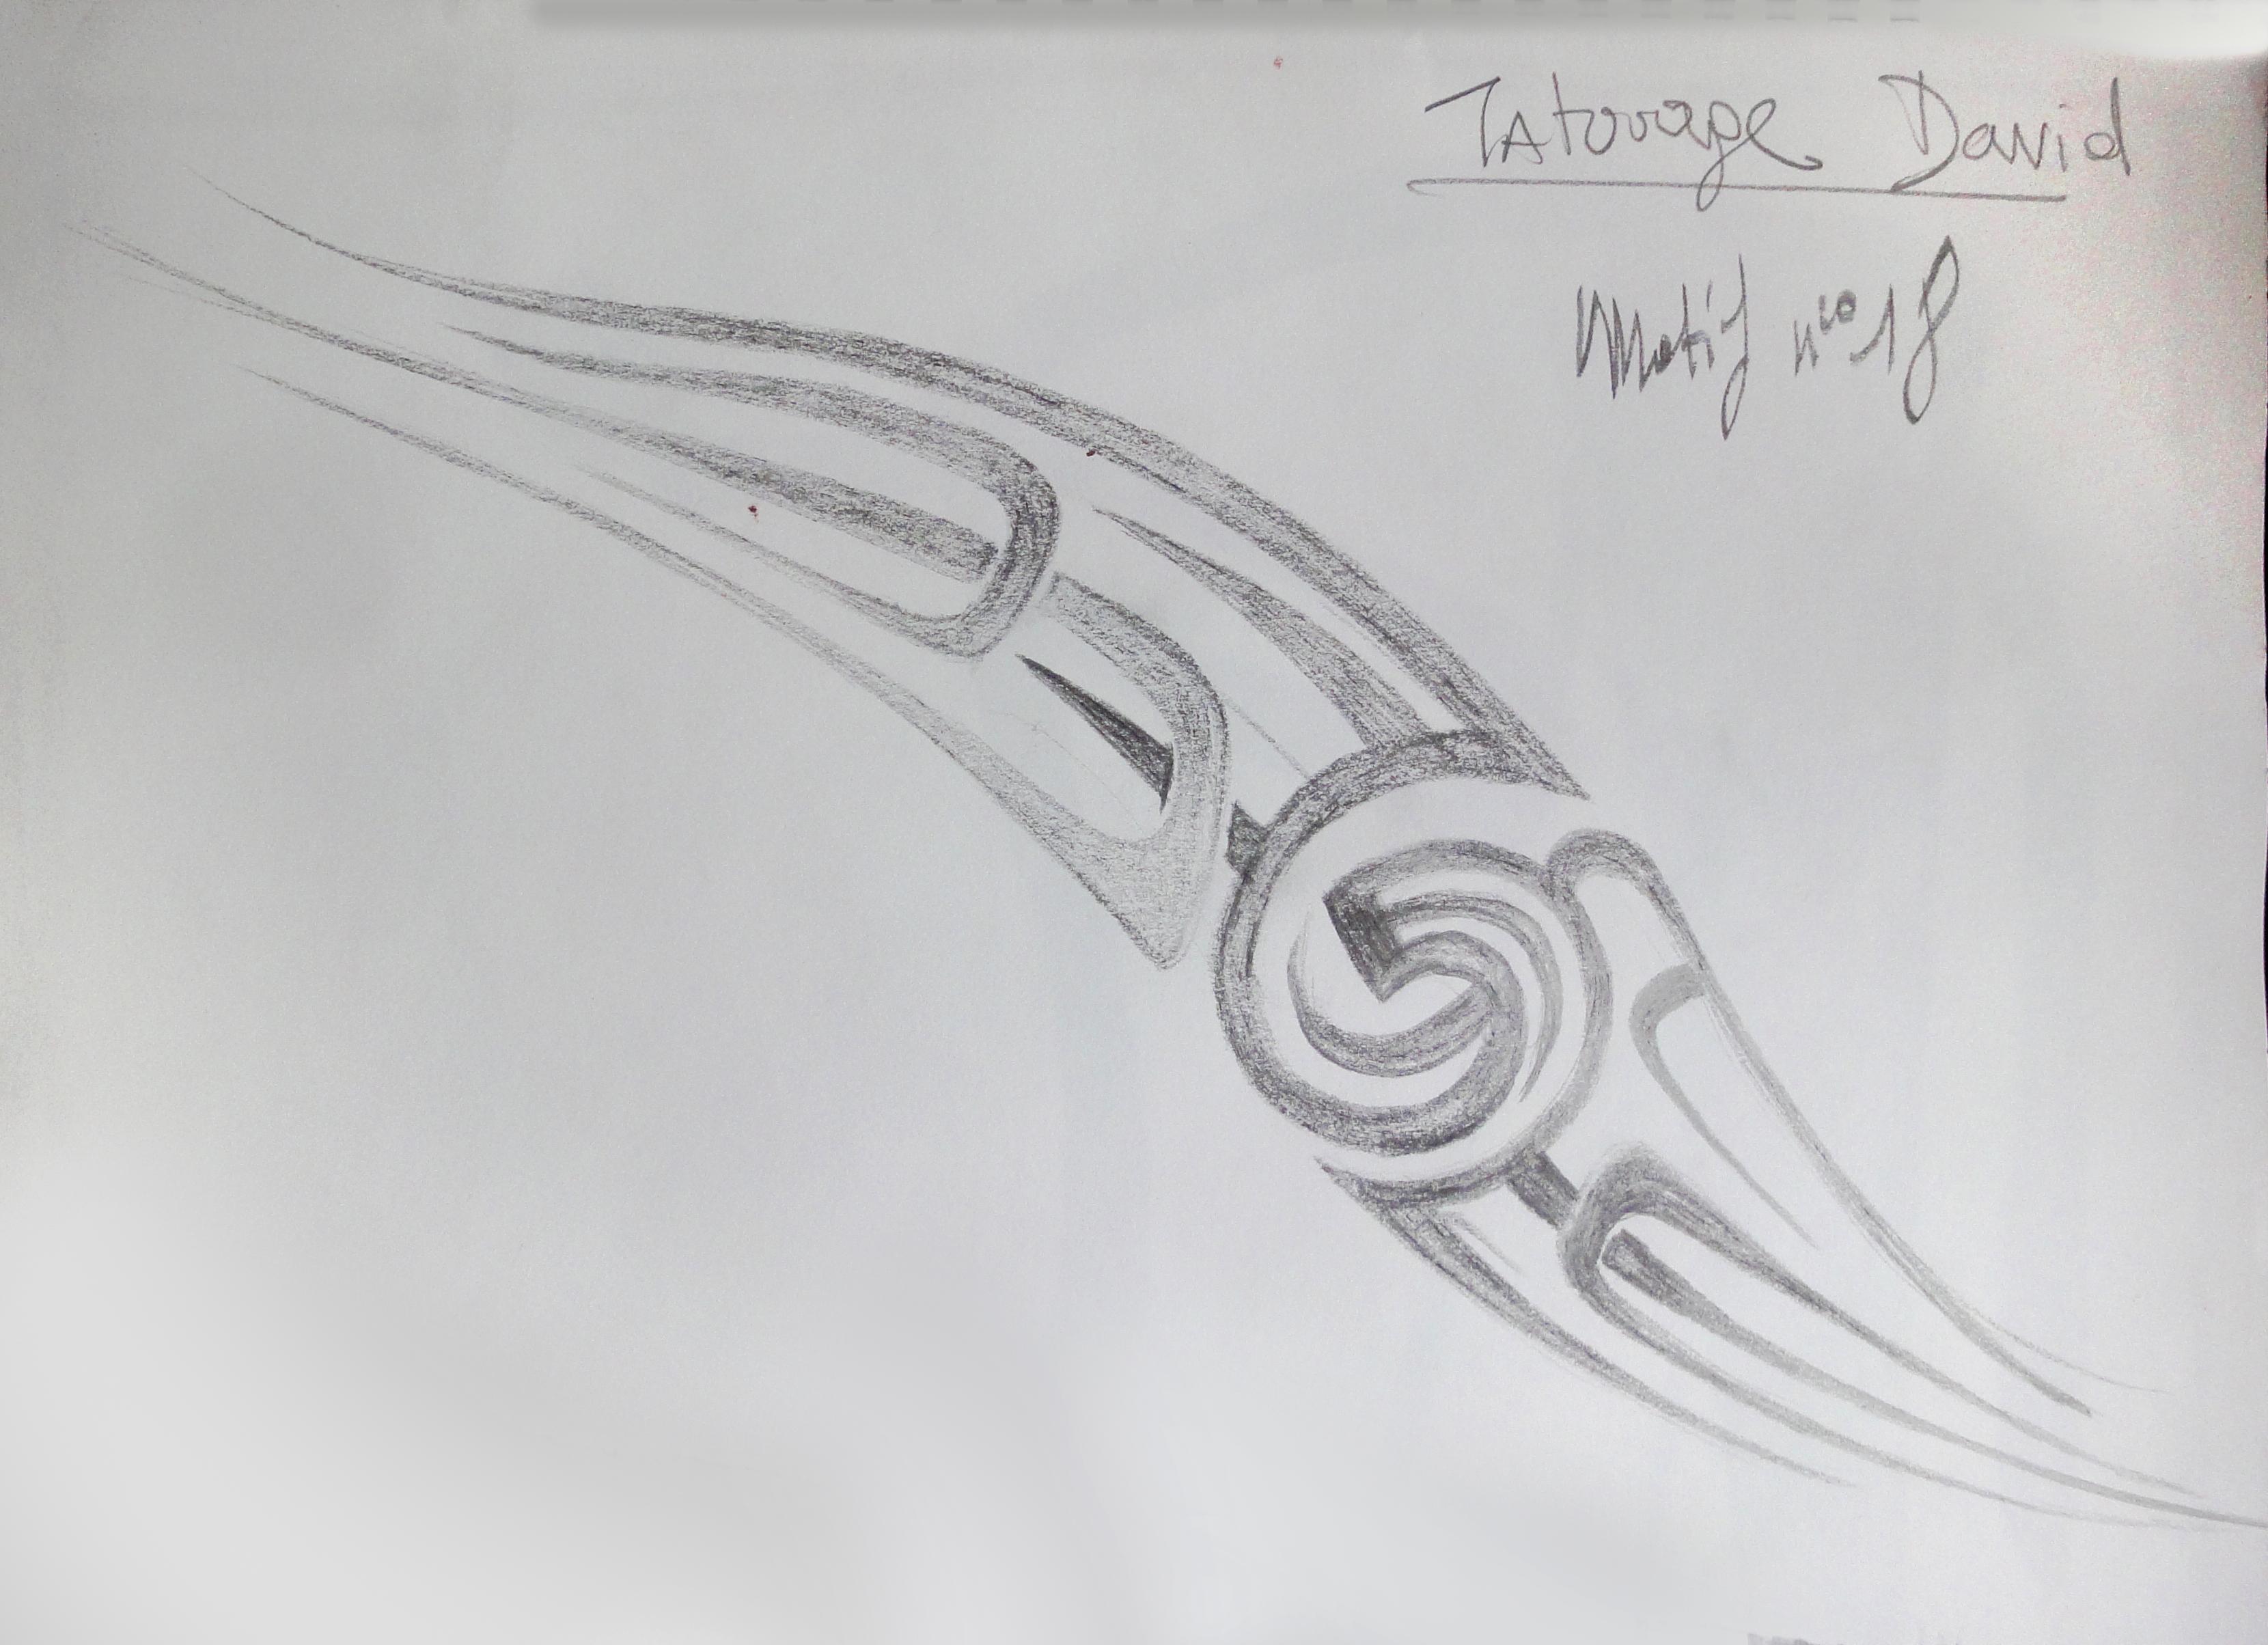 Tatouage David